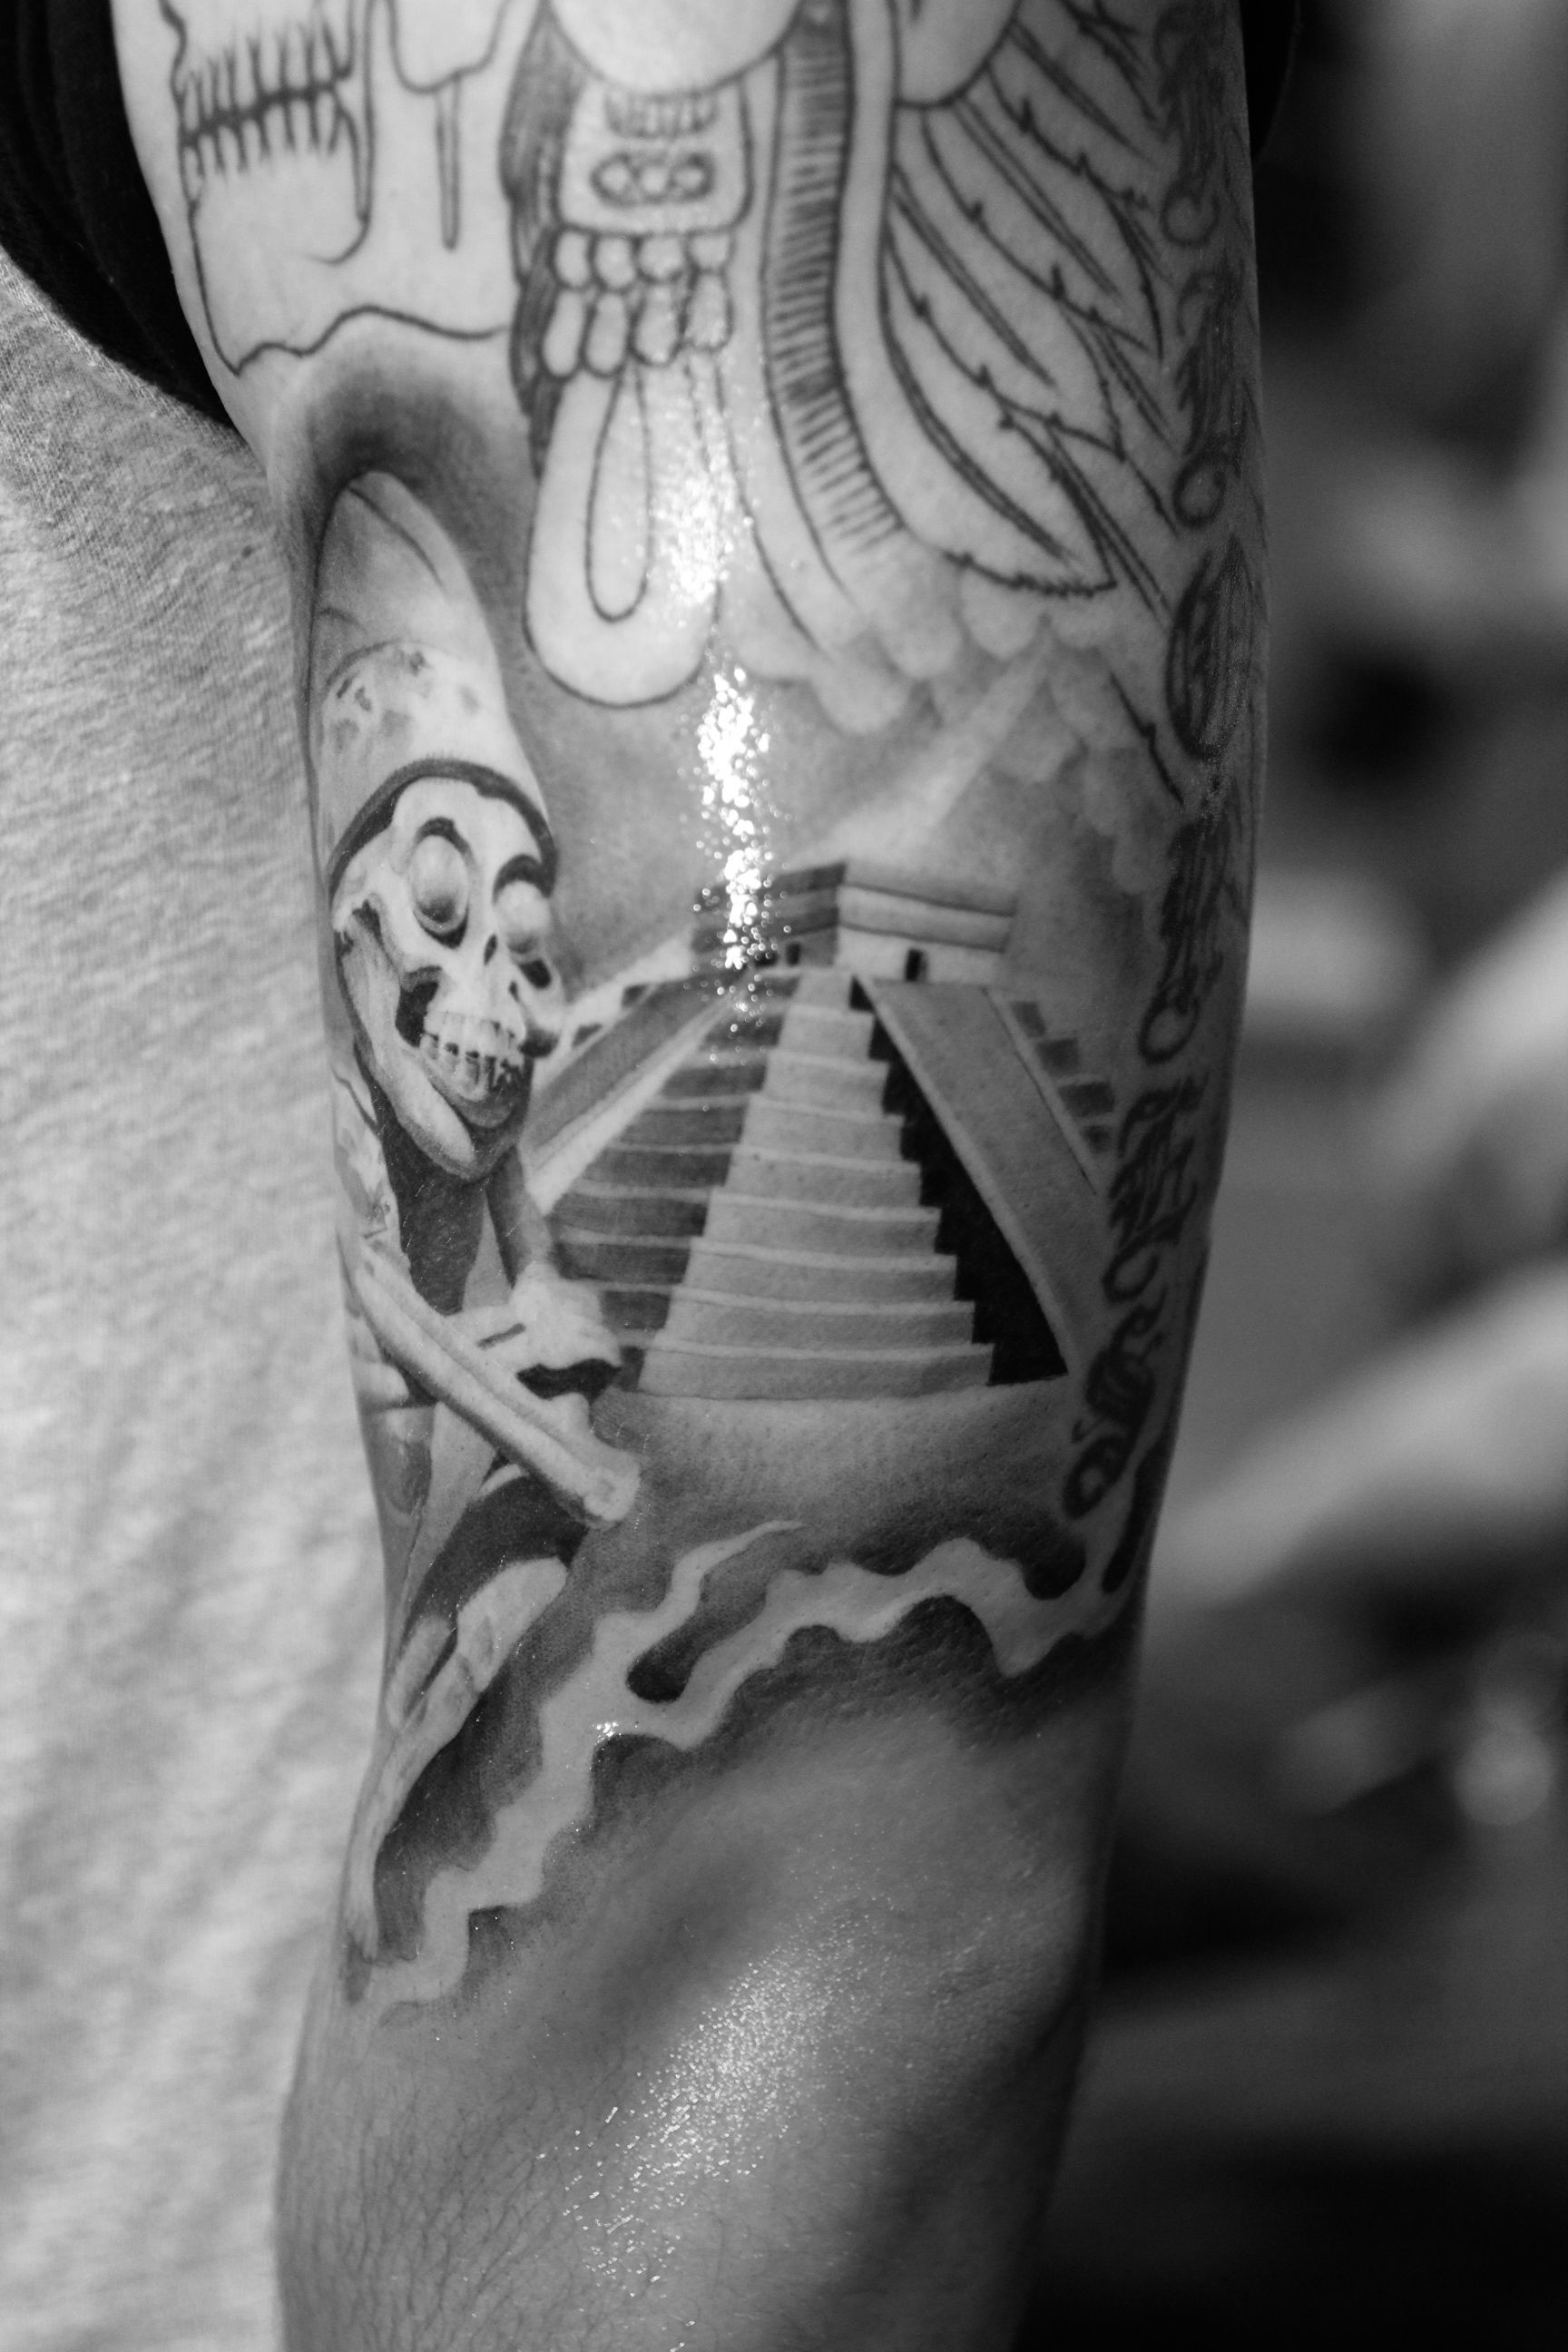 aztec tattoos design ideas for men and women more aztec tattoo and aztec tattoo designs ideas. Black Bedroom Furniture Sets. Home Design Ideas